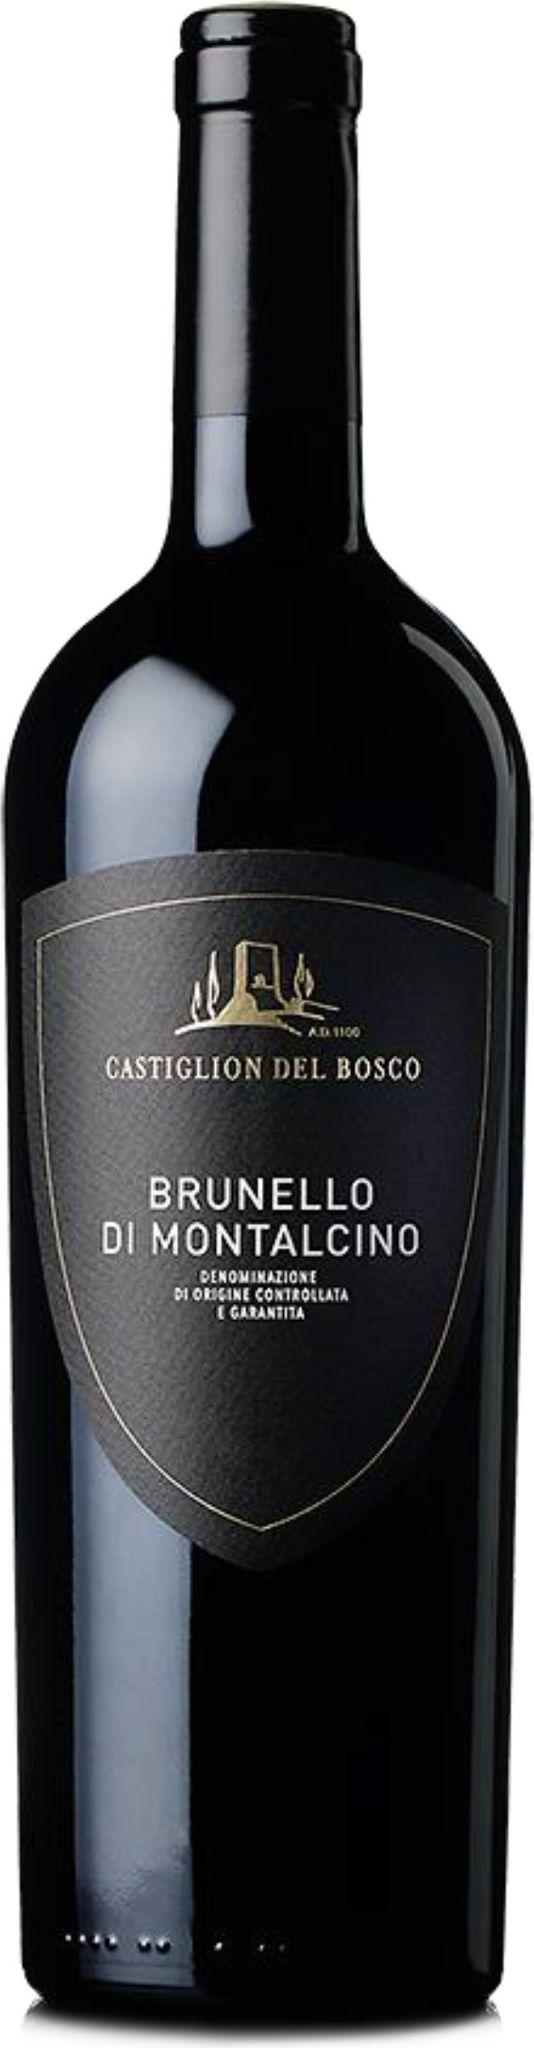 Produktbild på Castiglion del Bosco